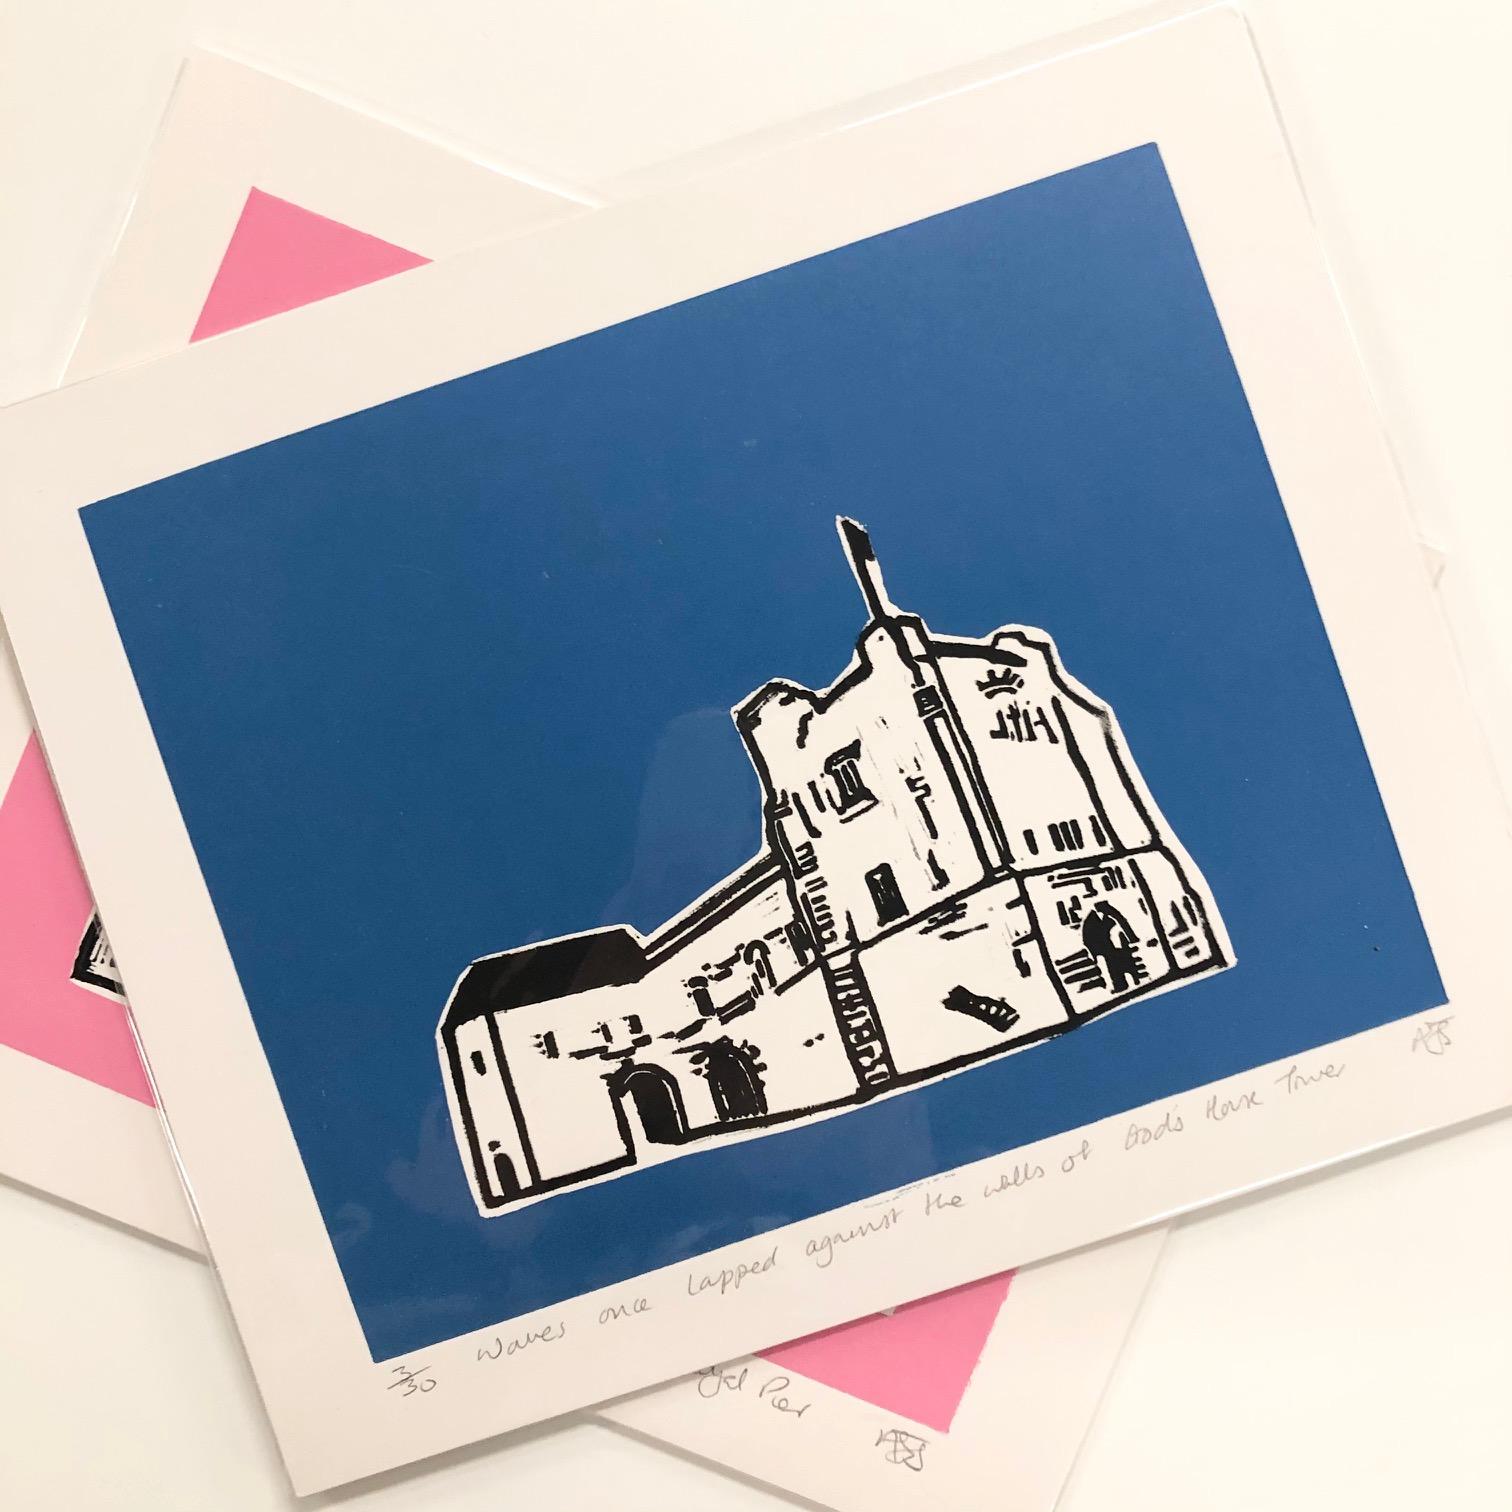 'Pop' Set of Prints by Mandy Smith